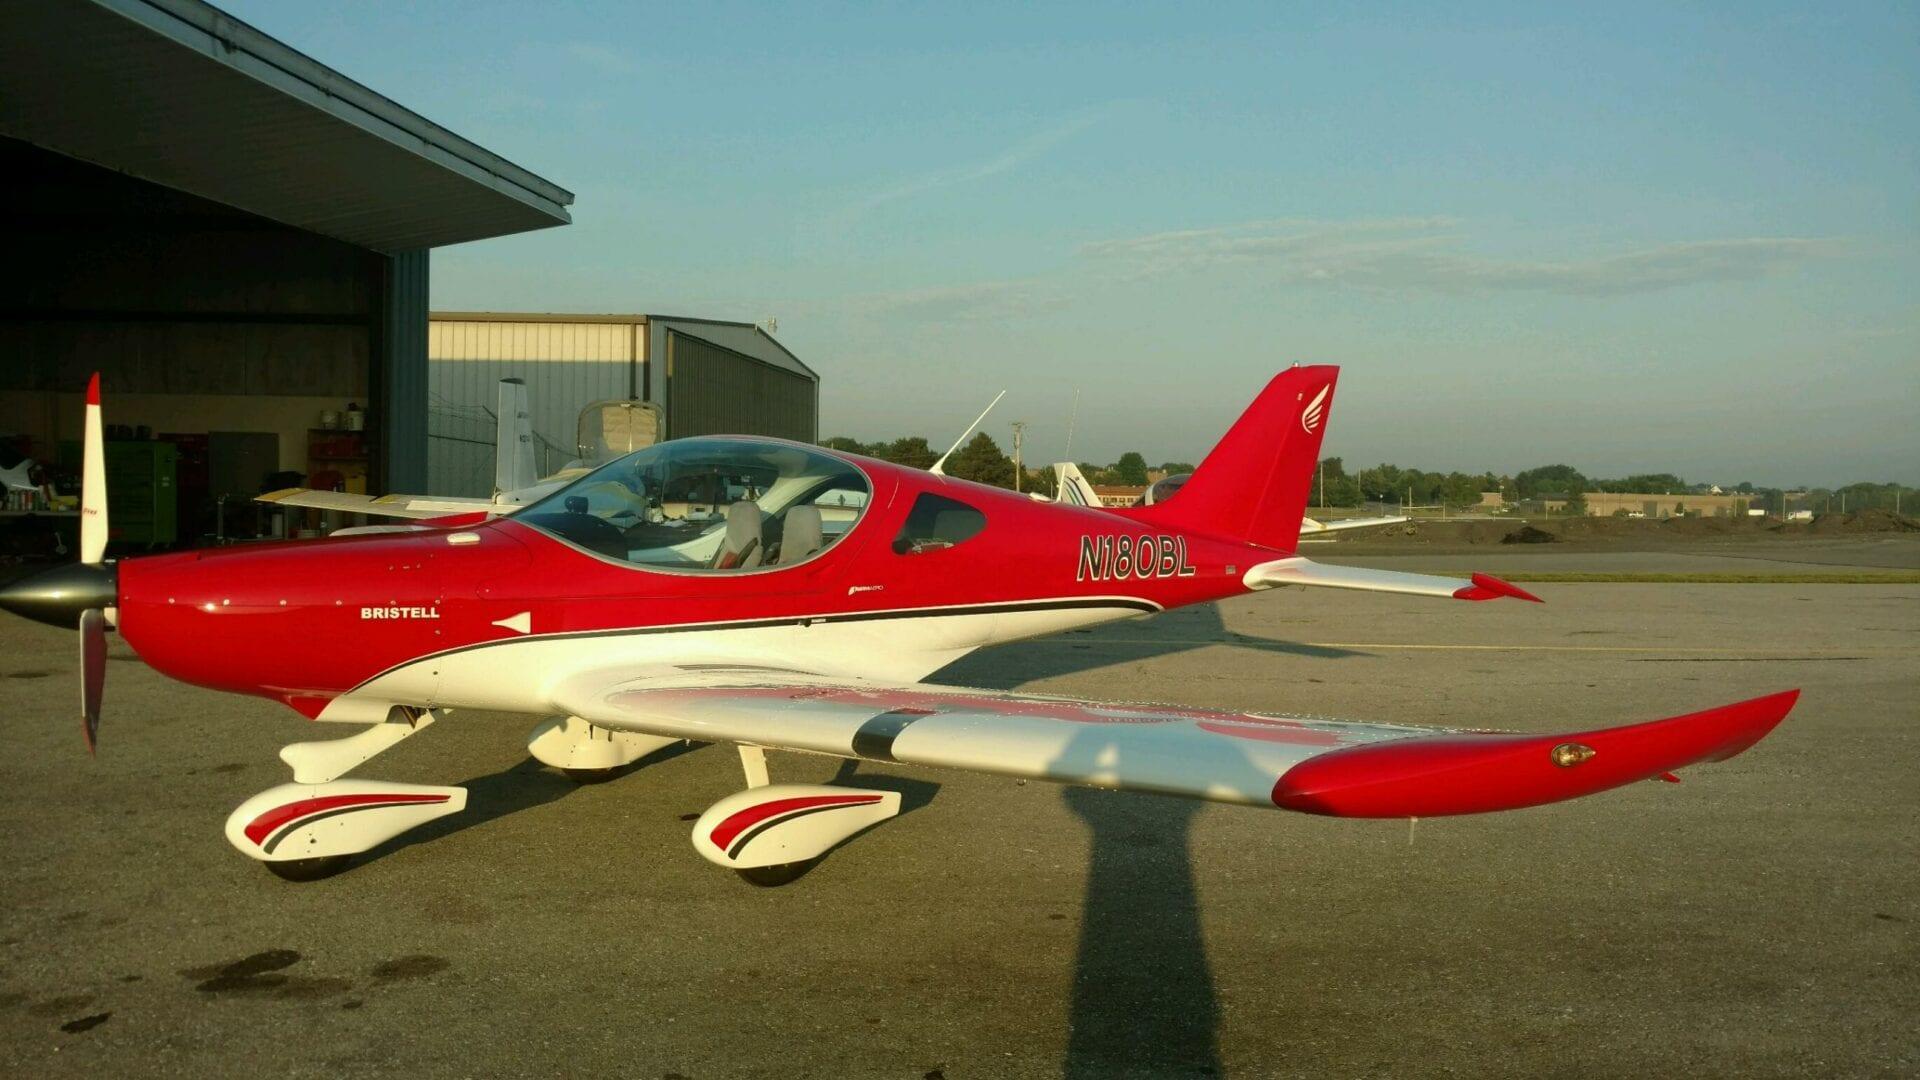 Bristell USA Light Sport Aircraft Sales and Training